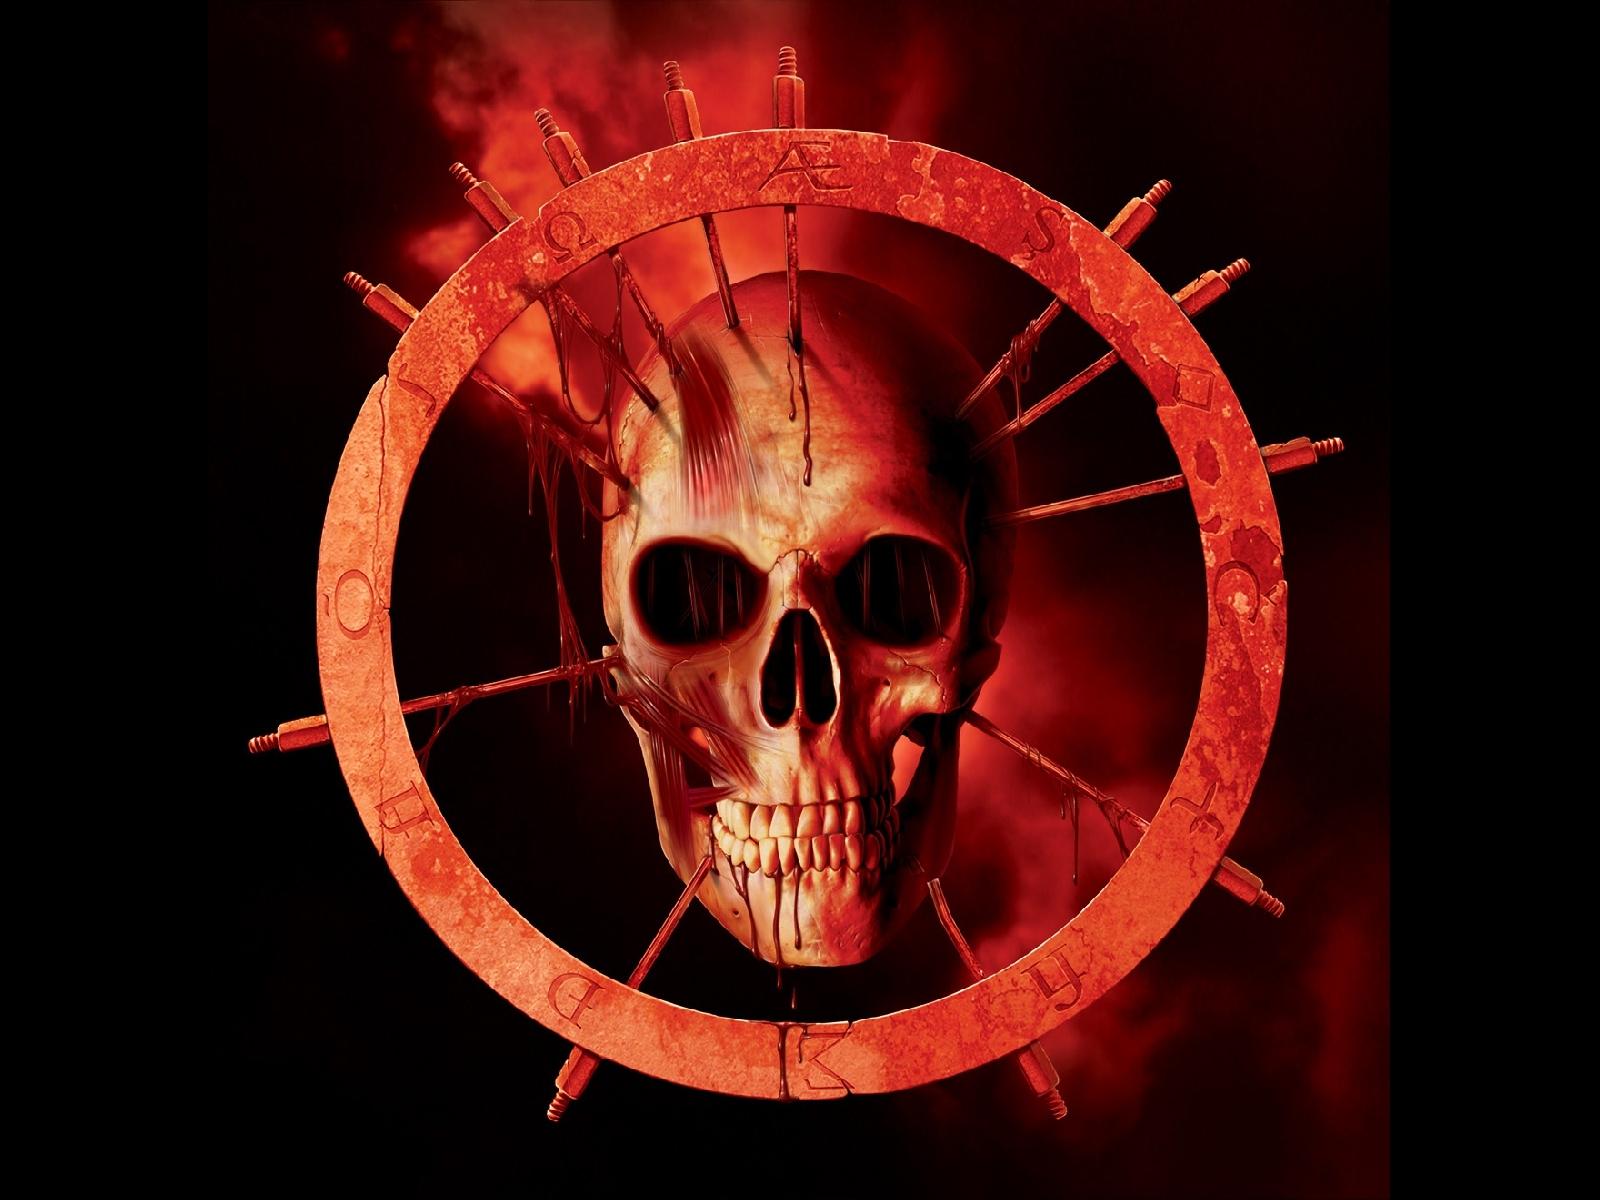 skulls dark demon satanic satan evil occult blood wallpaper background 1600x1200